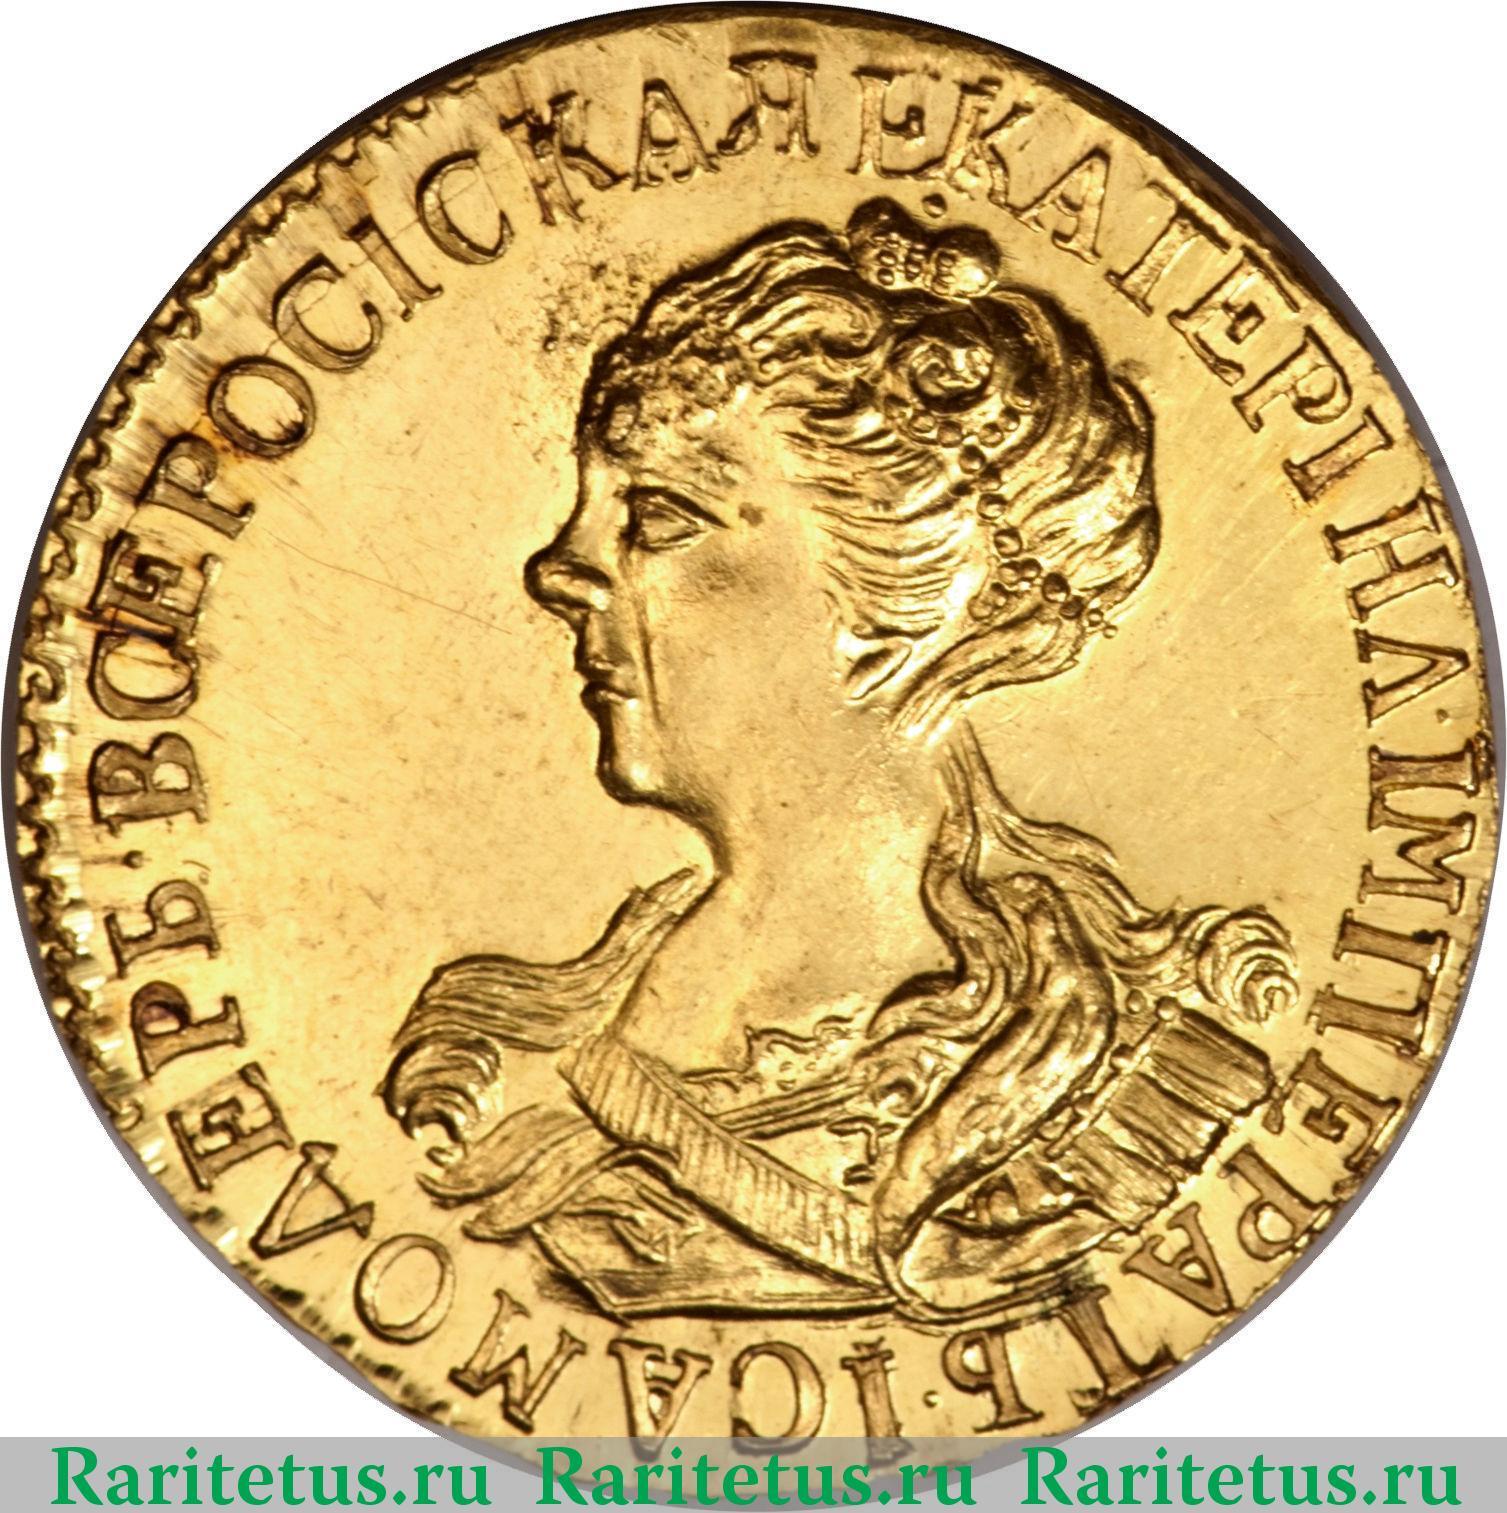 2 рубля 1726 новодел (новодел) : от 261 914 до 1,08 млн ...